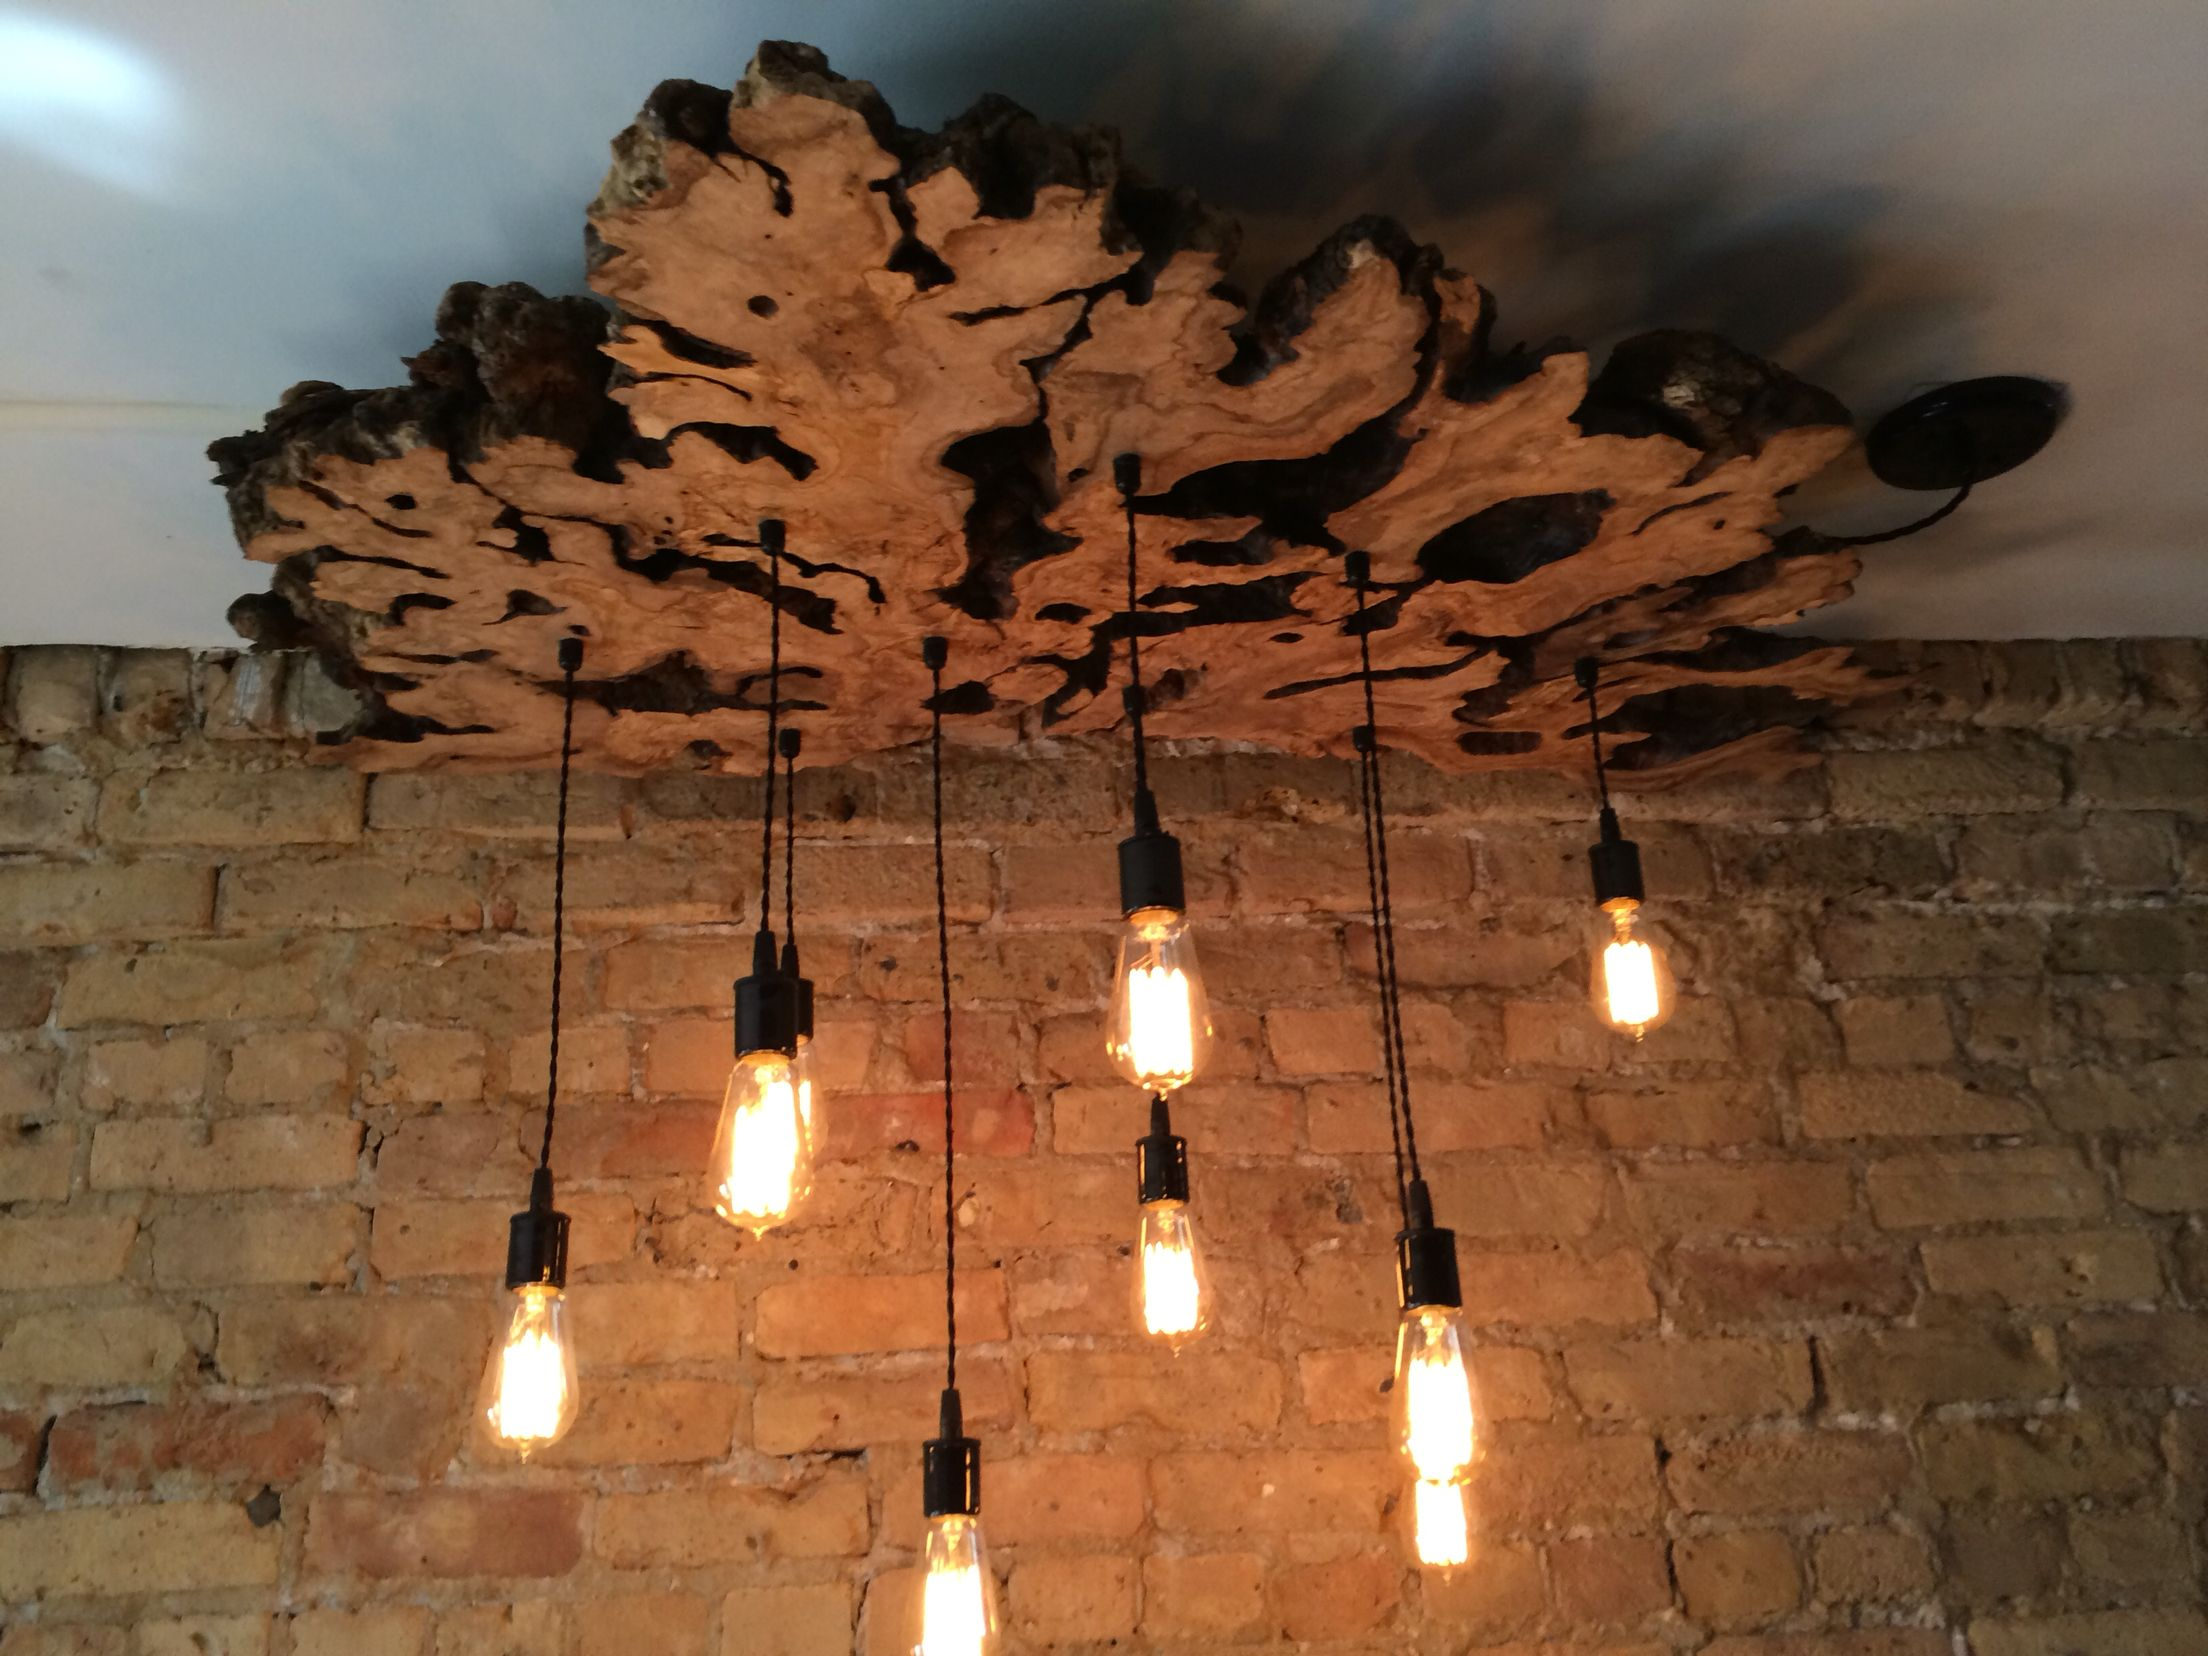 Rustic Wood Chandeliers live edge chandelier7m woodworking @7mwoodworking #design